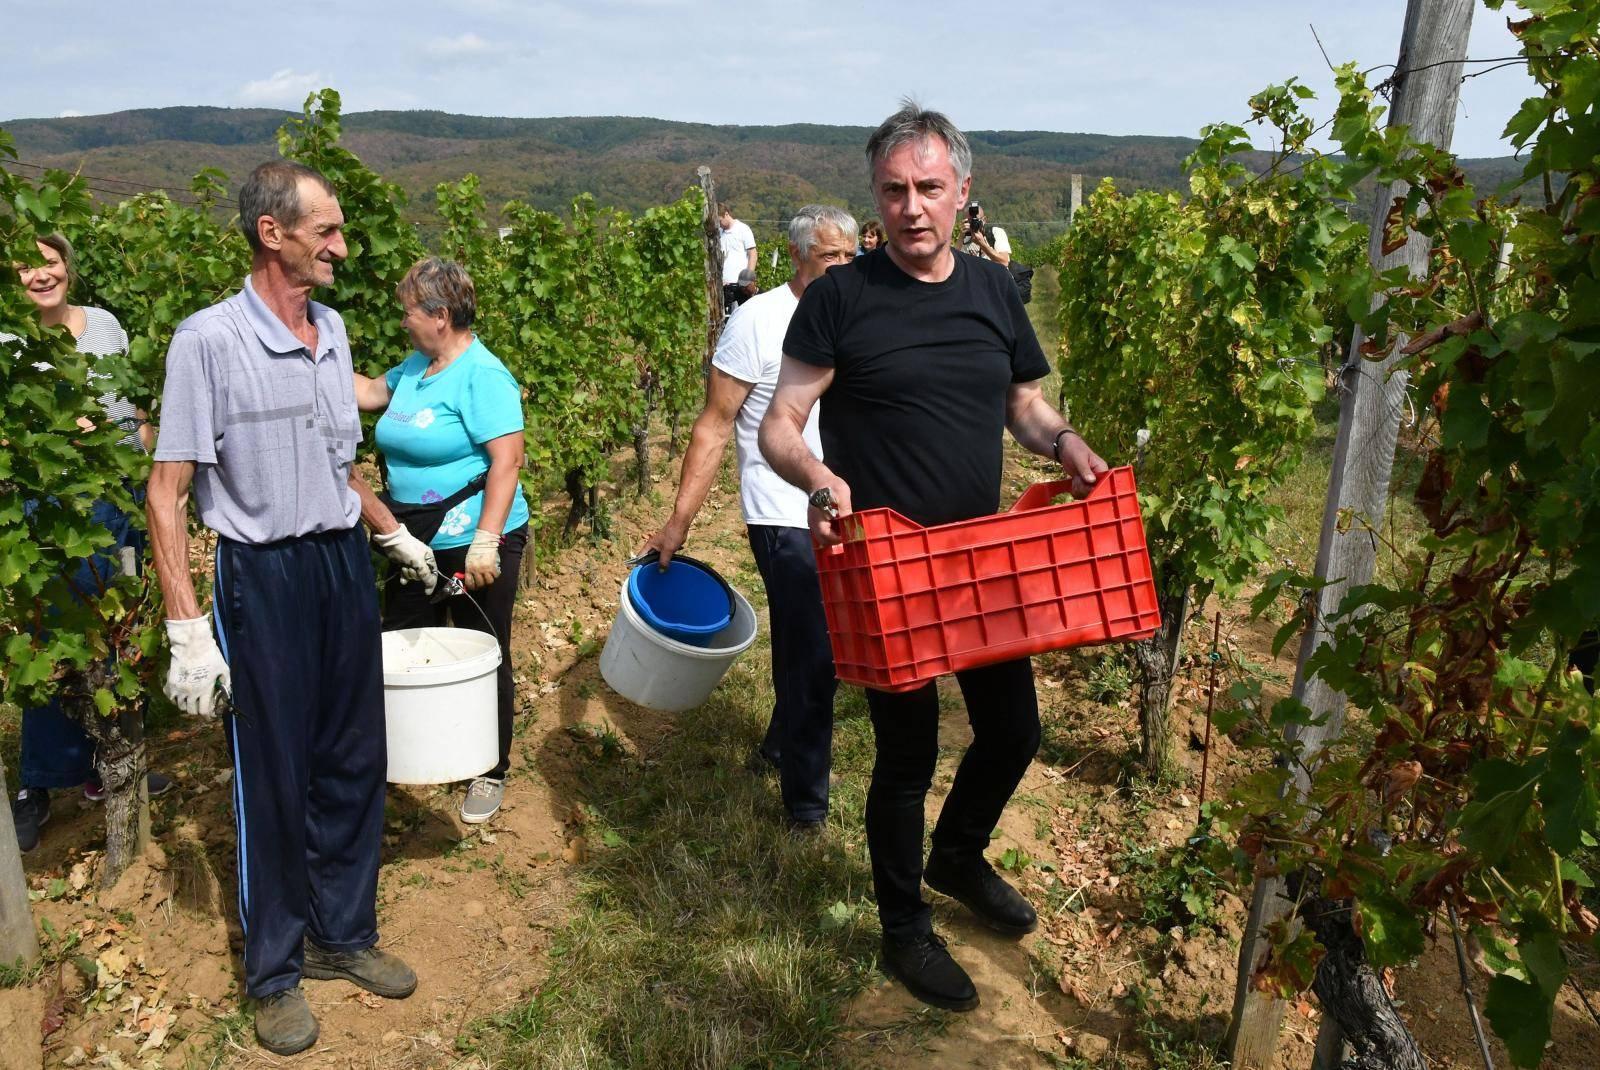 Mitrovac: Berba grožđa u vinogradupredsjedničkog kandidata Miroslava Škore